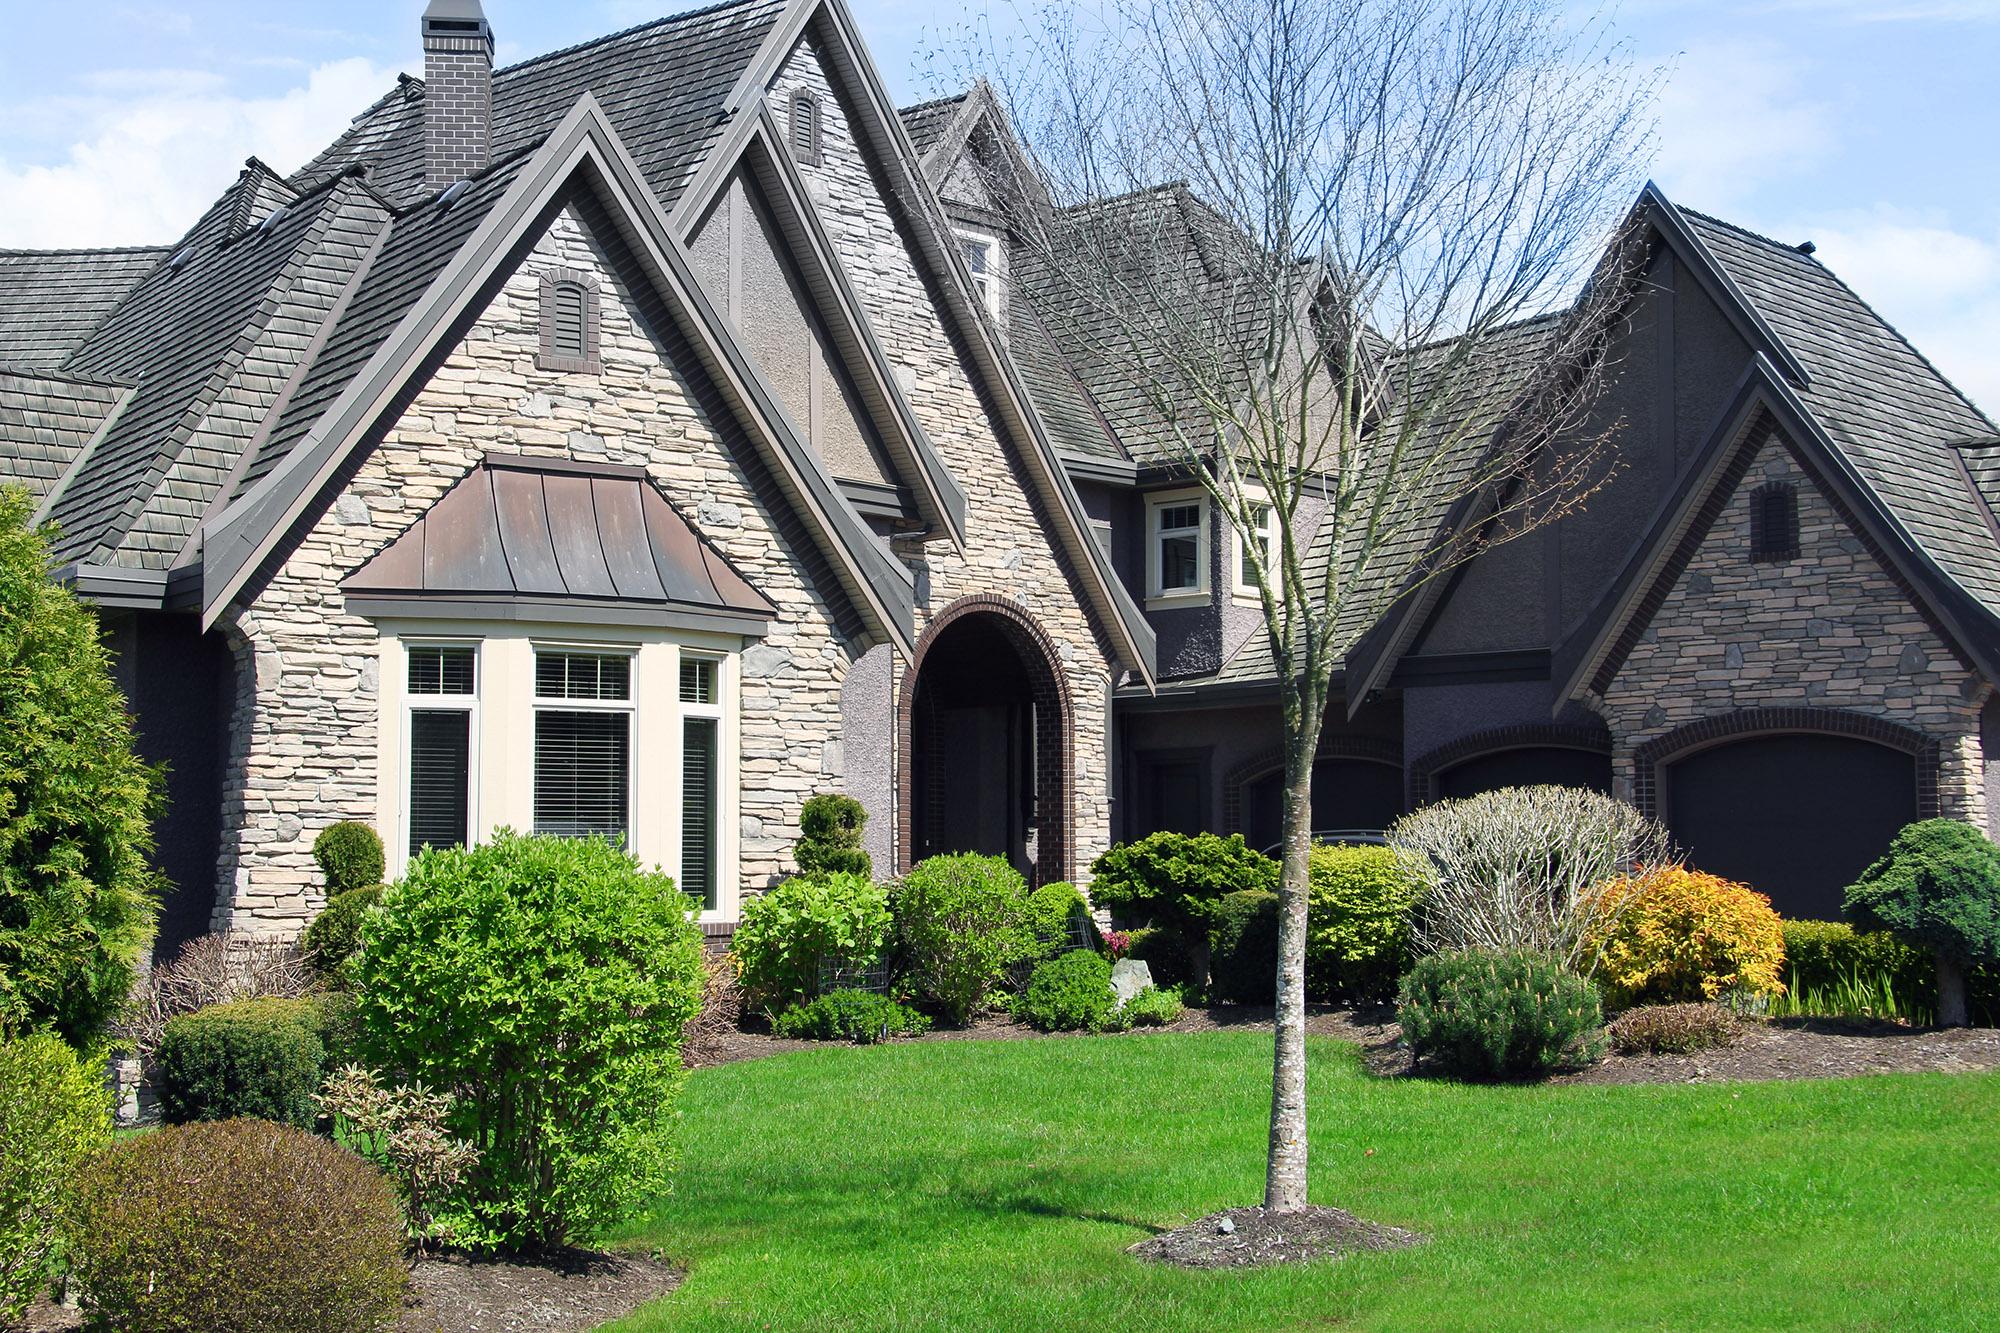 Beautiful large luxurious home in an upscale neighbourhood.